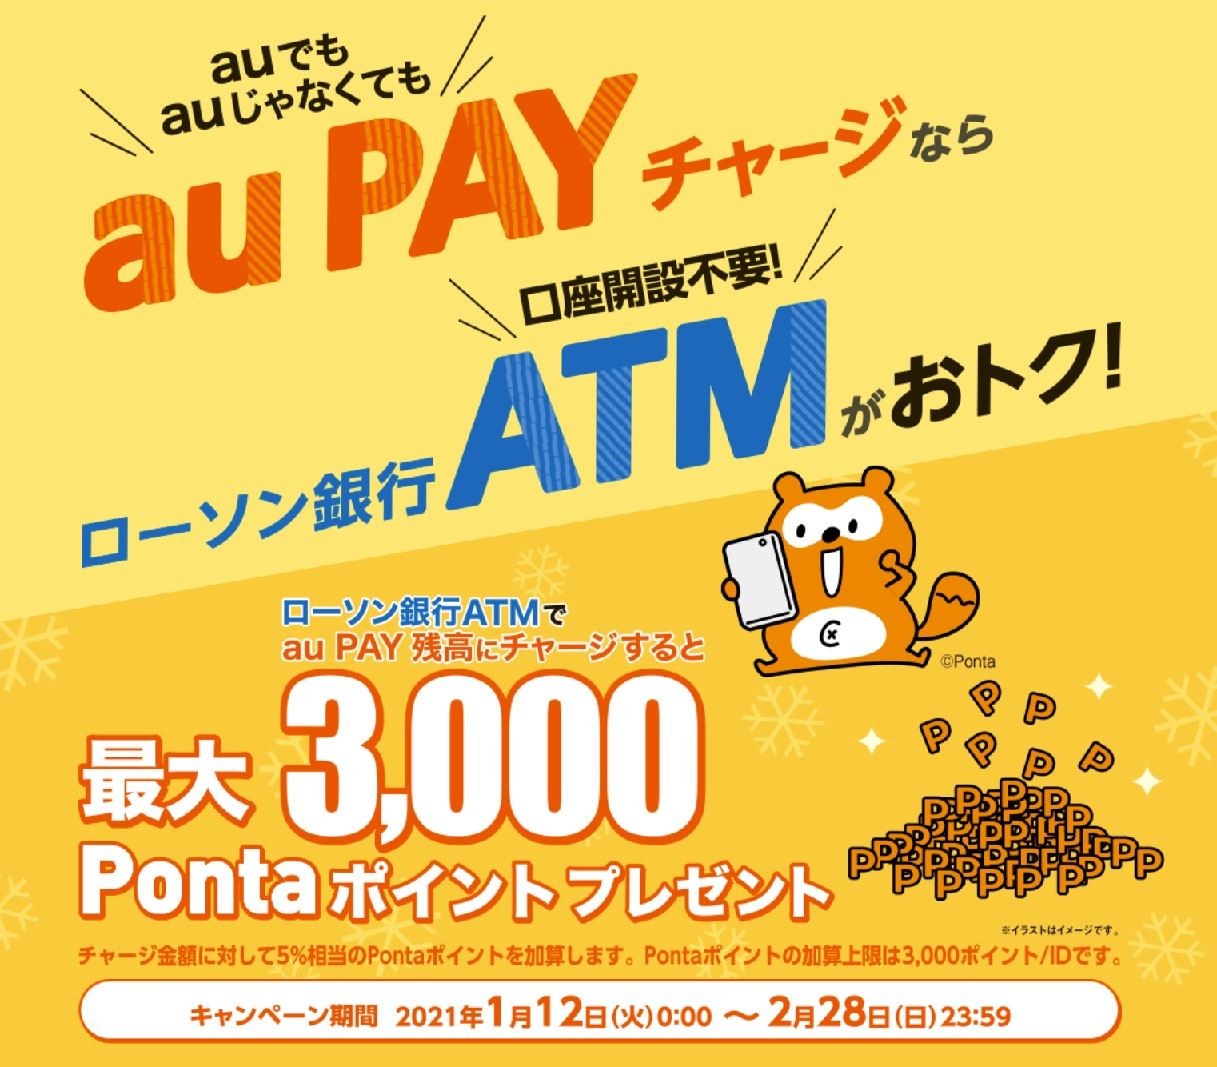 au Payへのチャージはローソン銀行ATMがお得